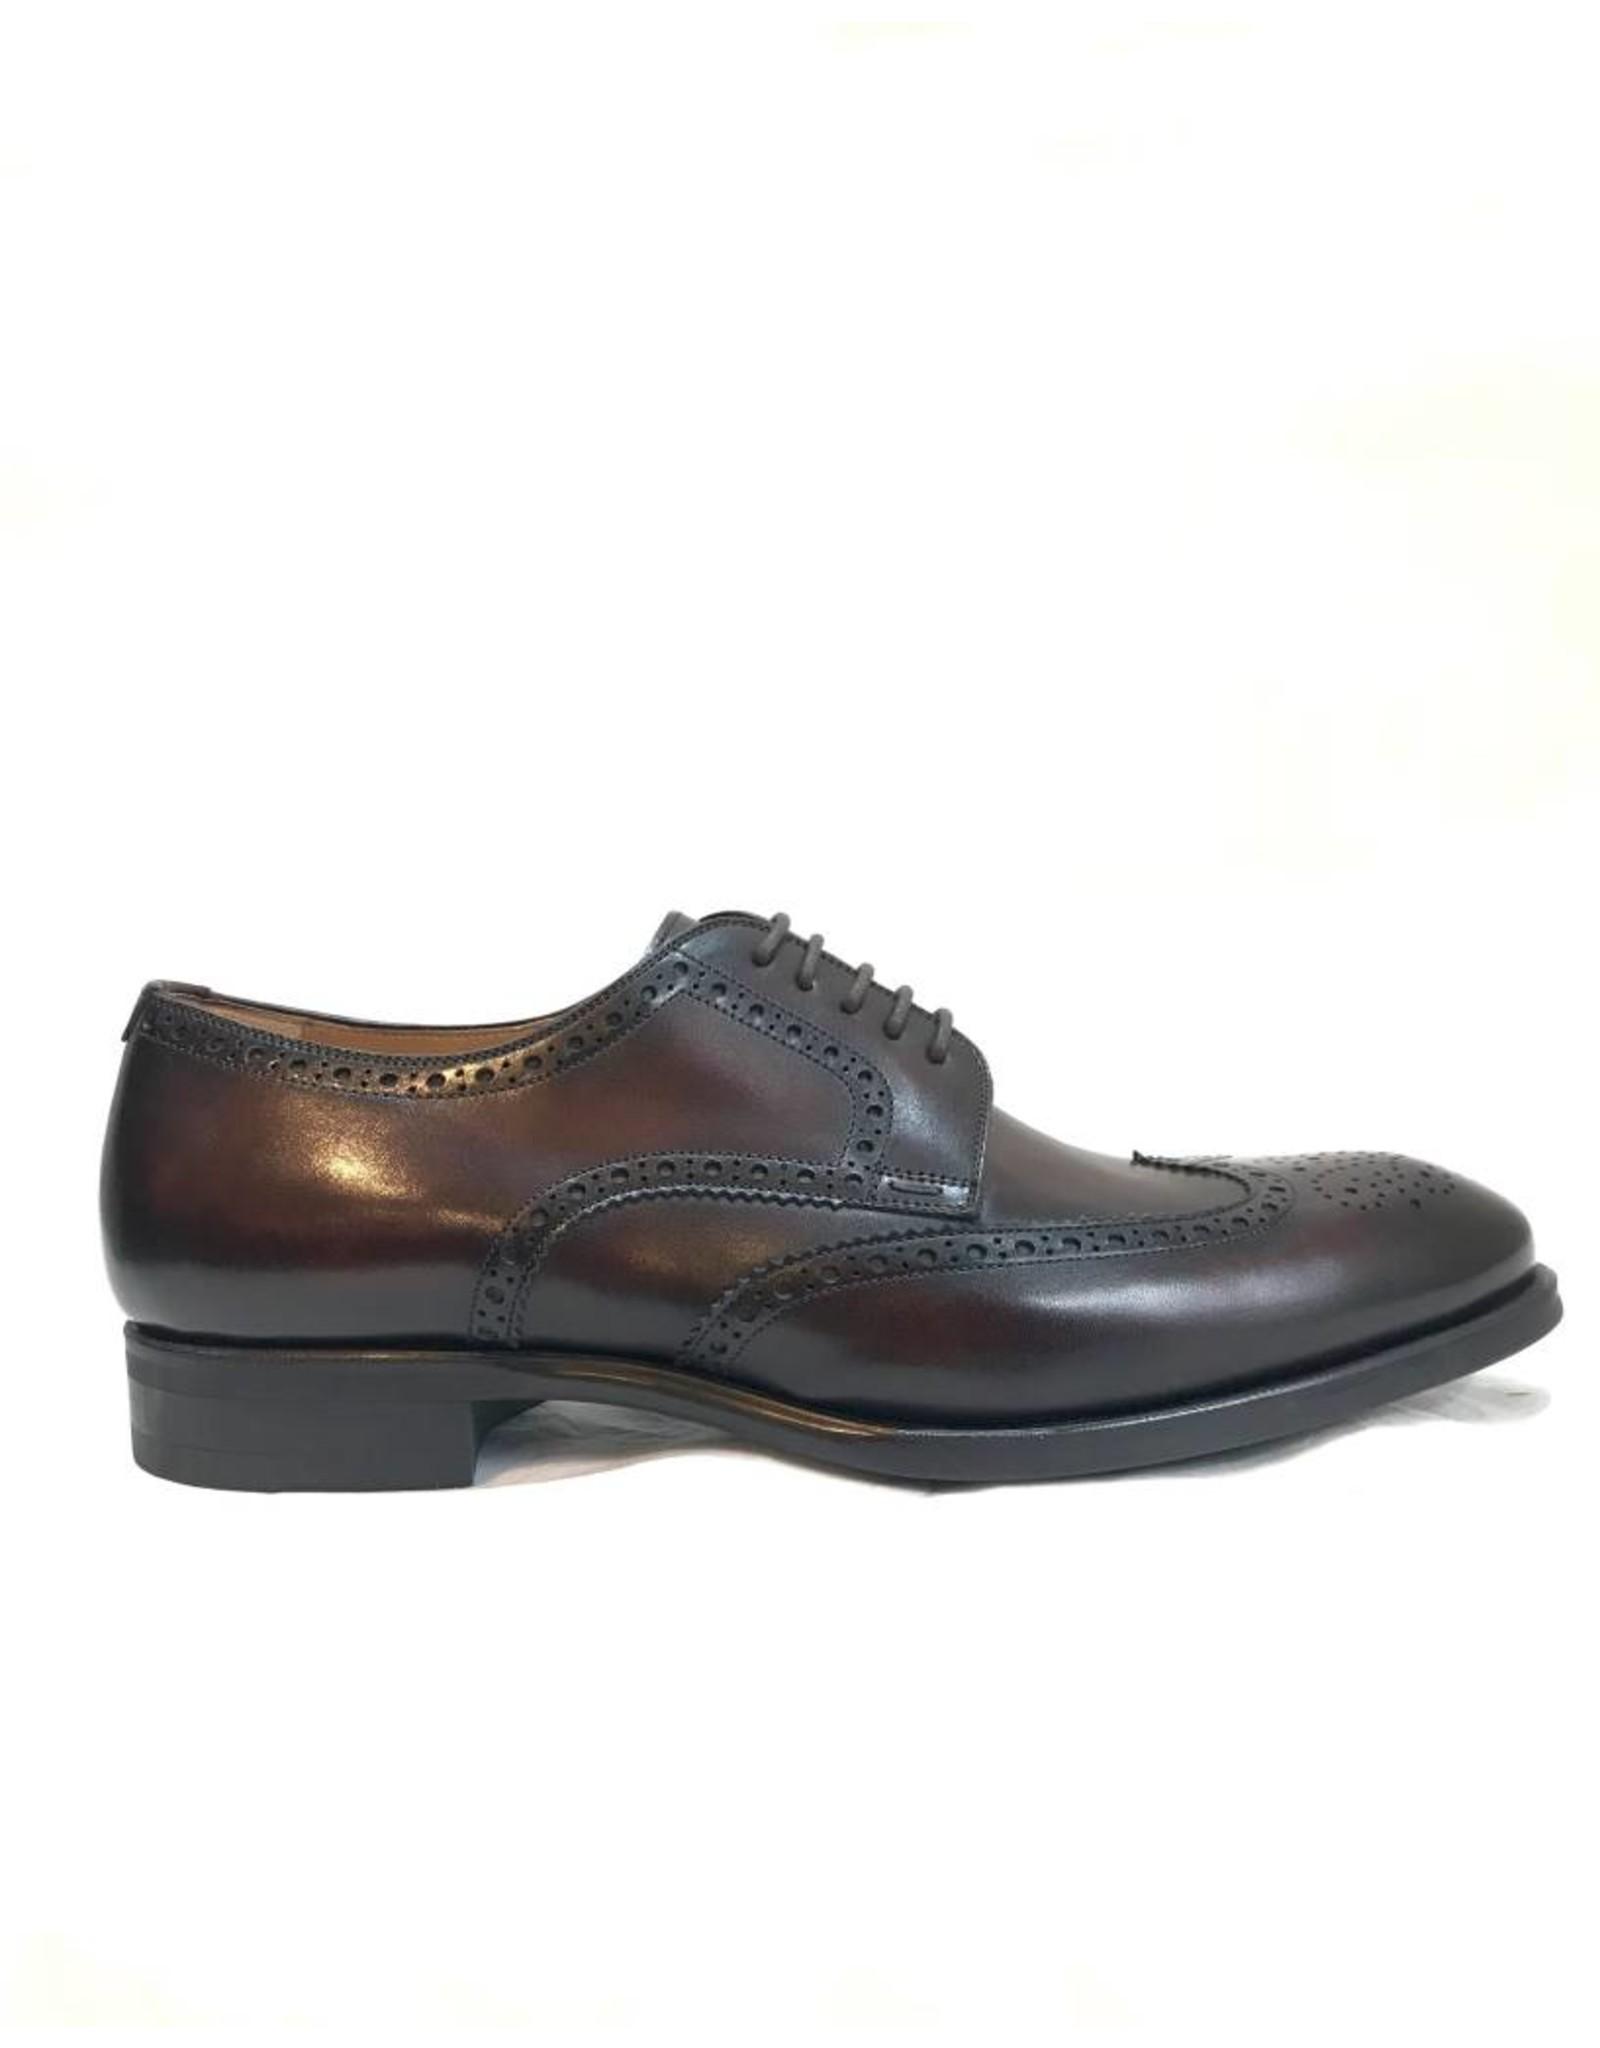 Magnanni Leather Brogue